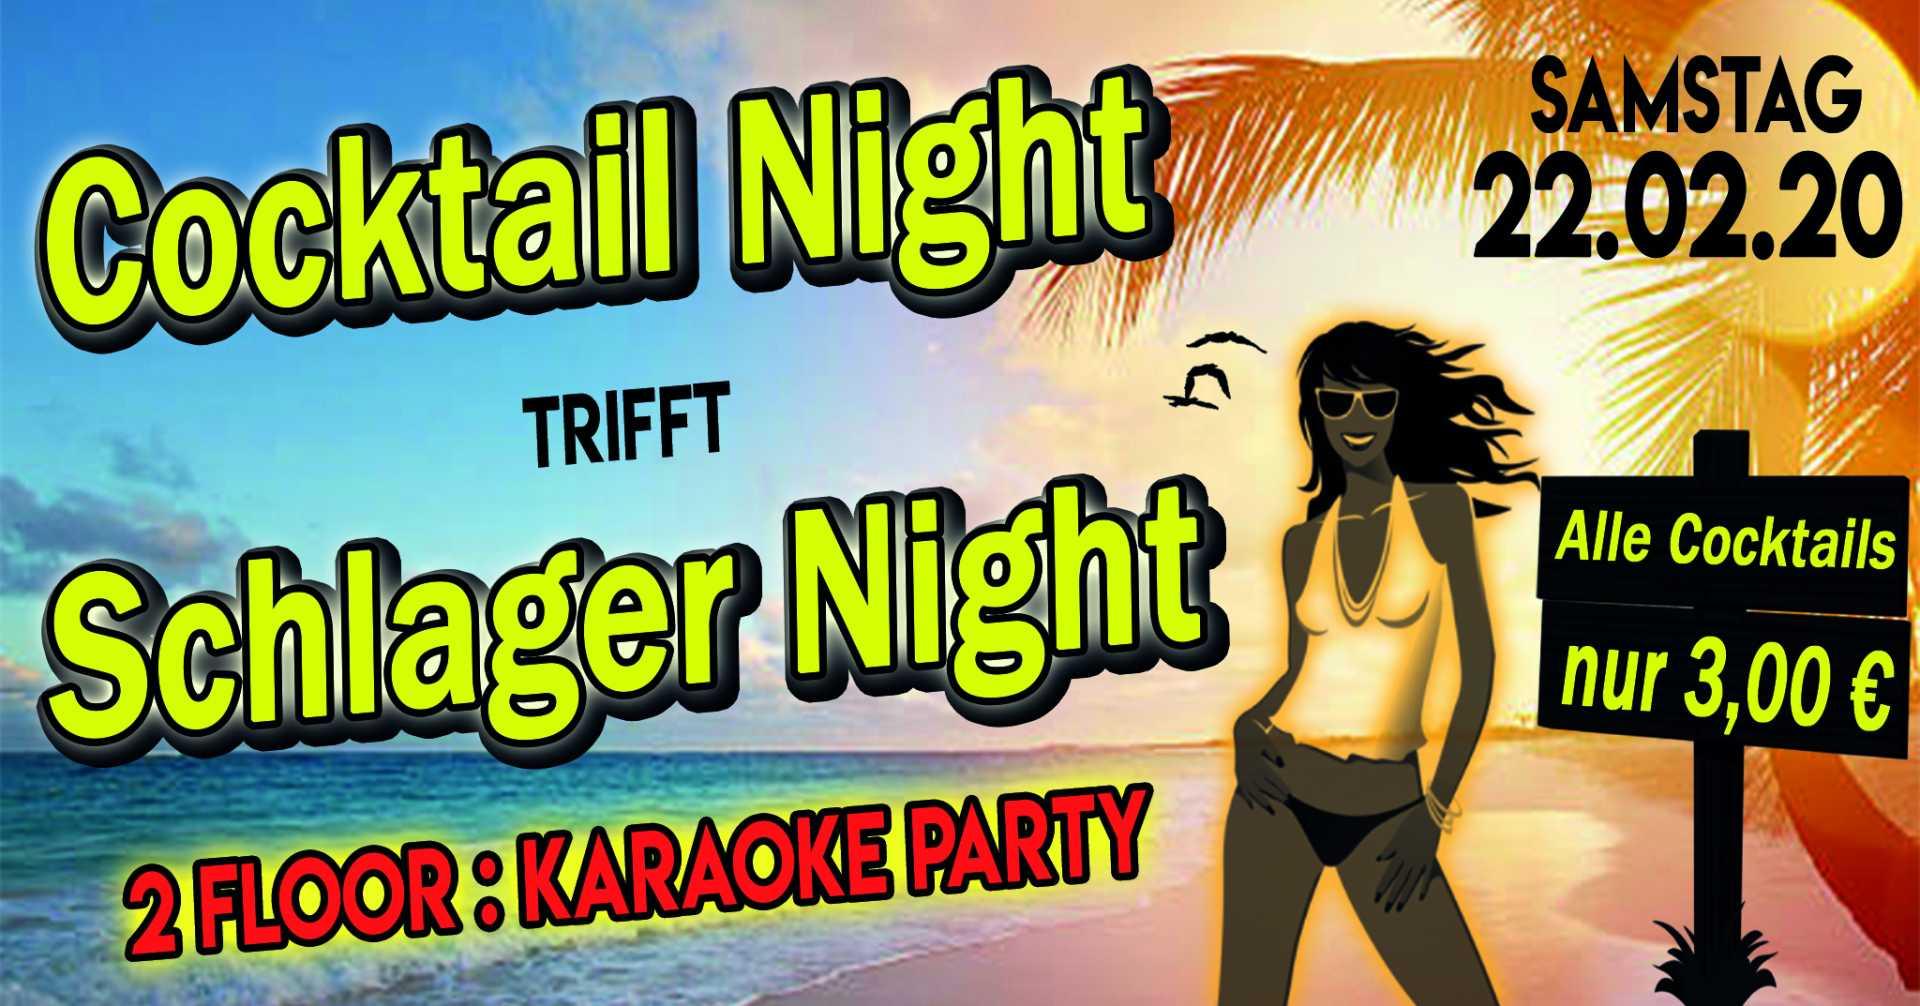 22.02.2020 Cocktail Night trifft Schlager Night